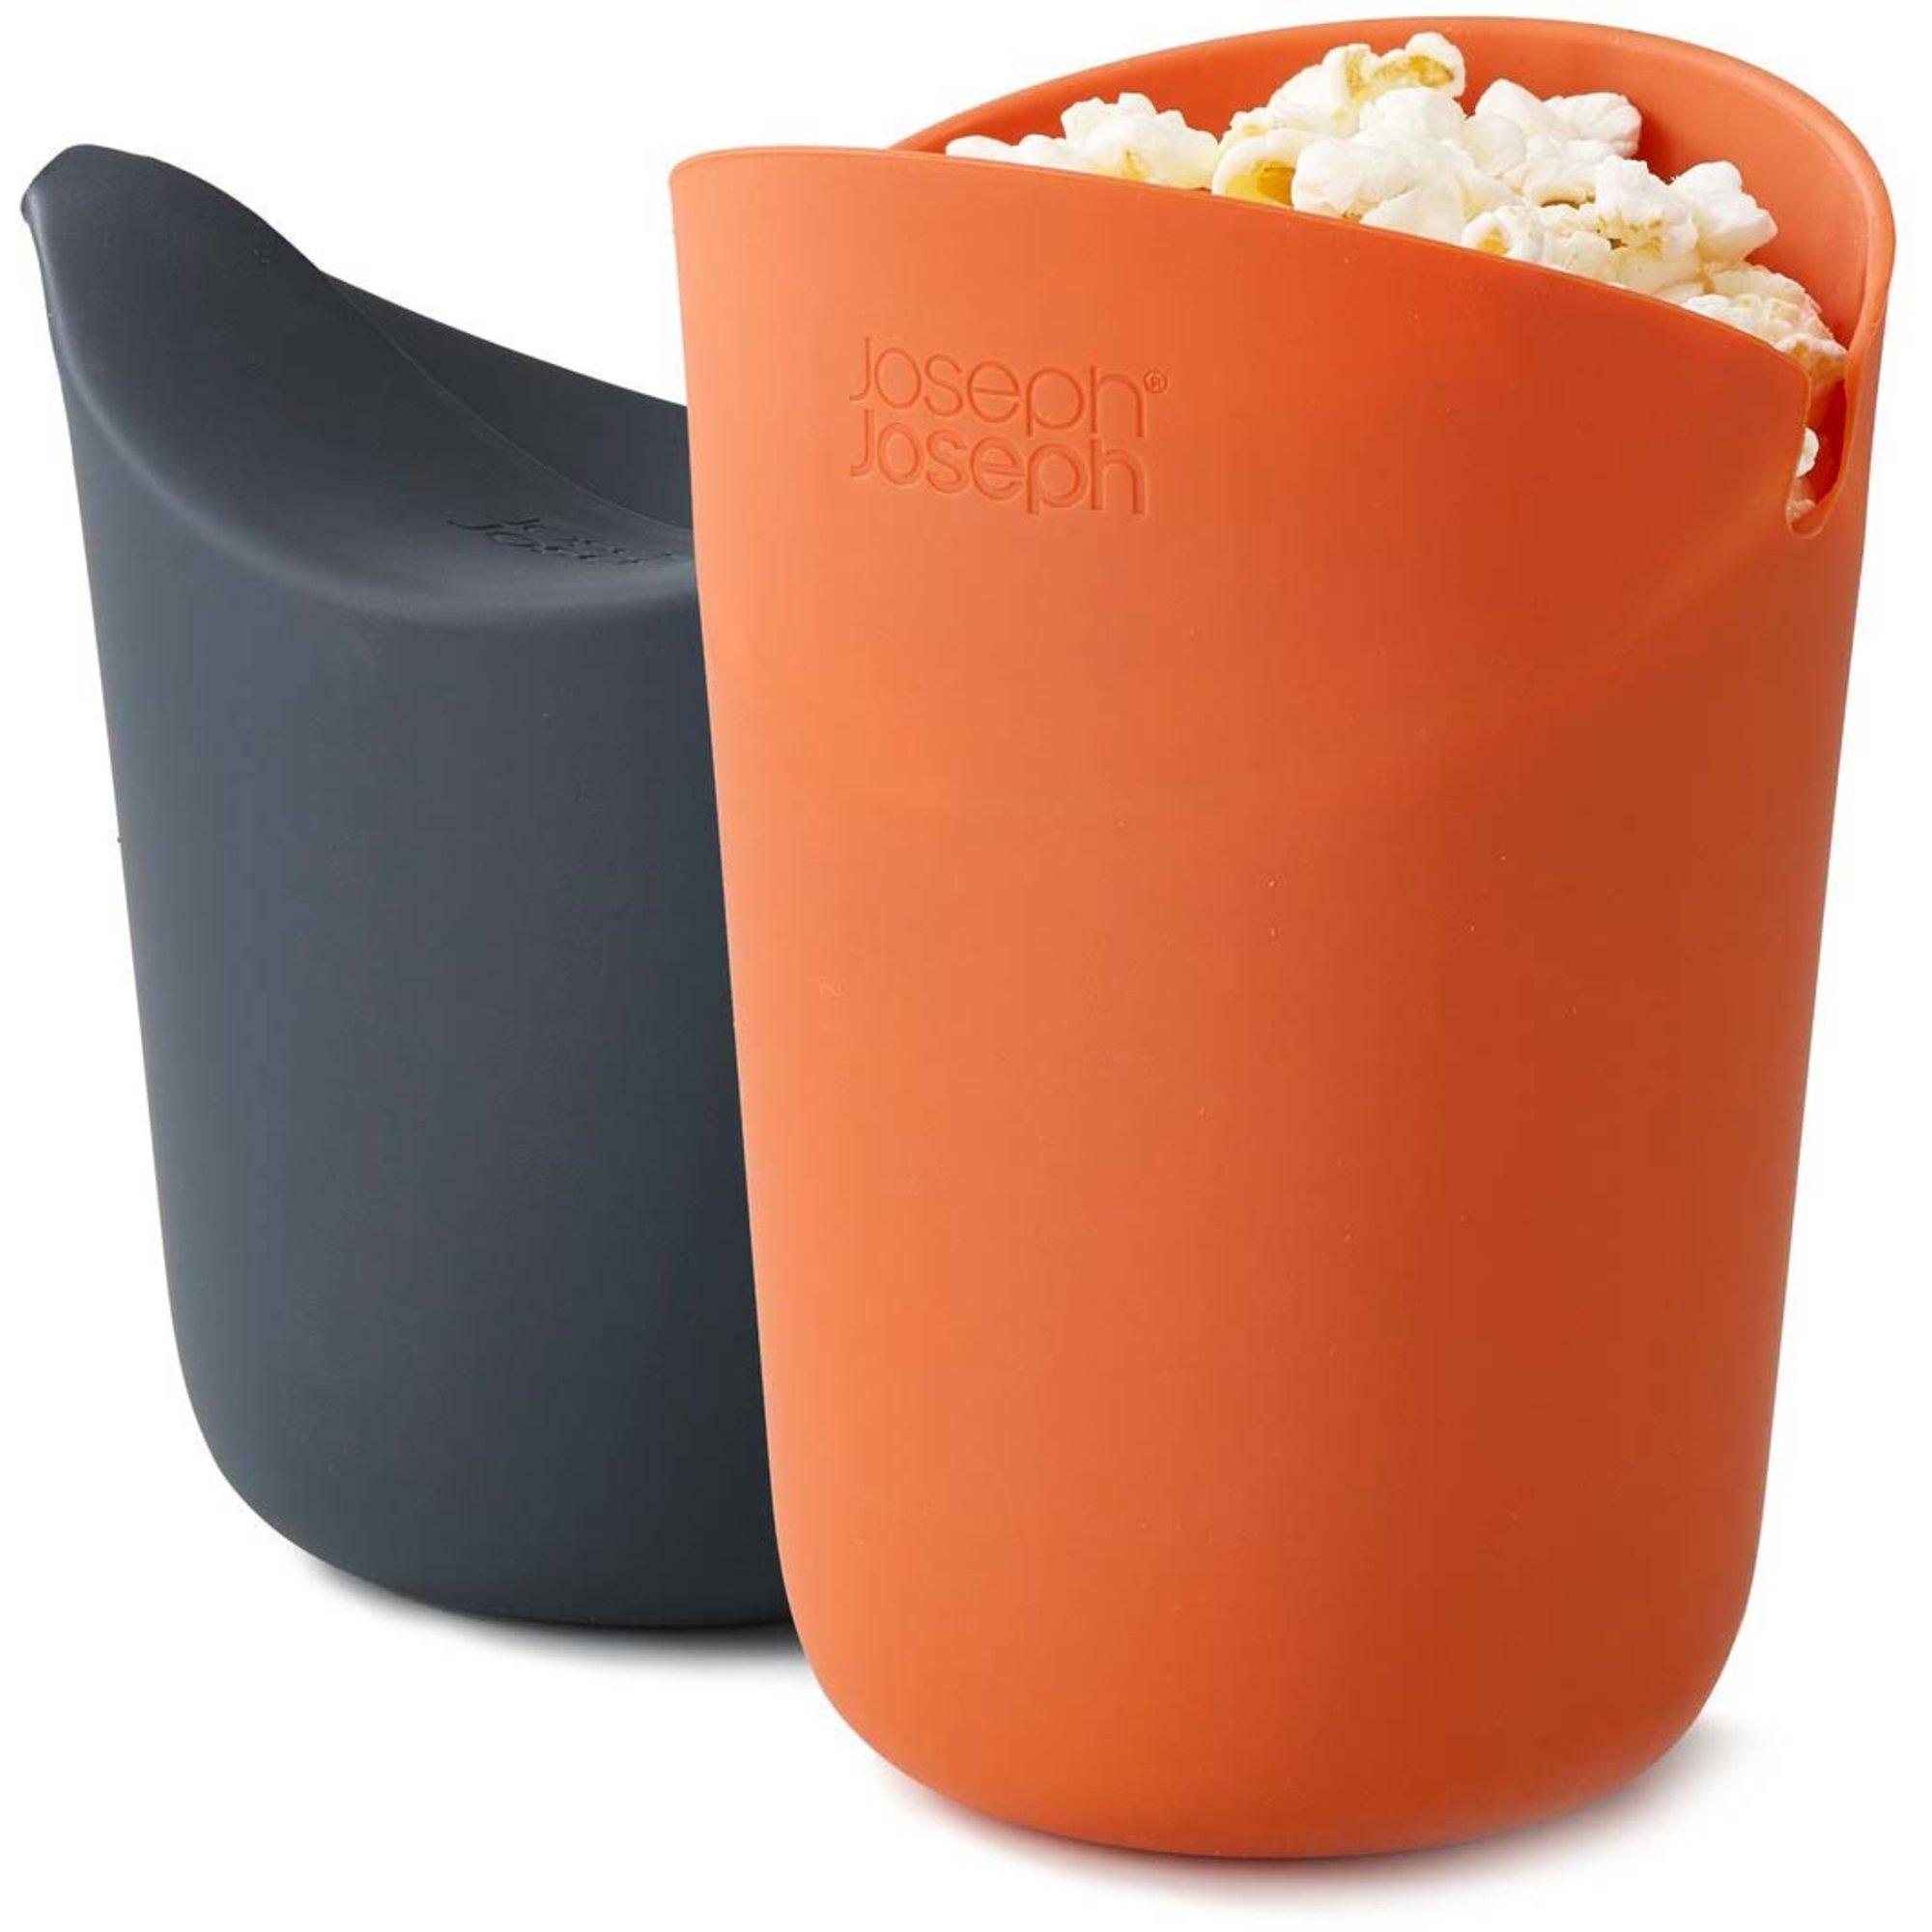 Joseph Joseph M-Cuisine Portion Popcorn Make 2 st.